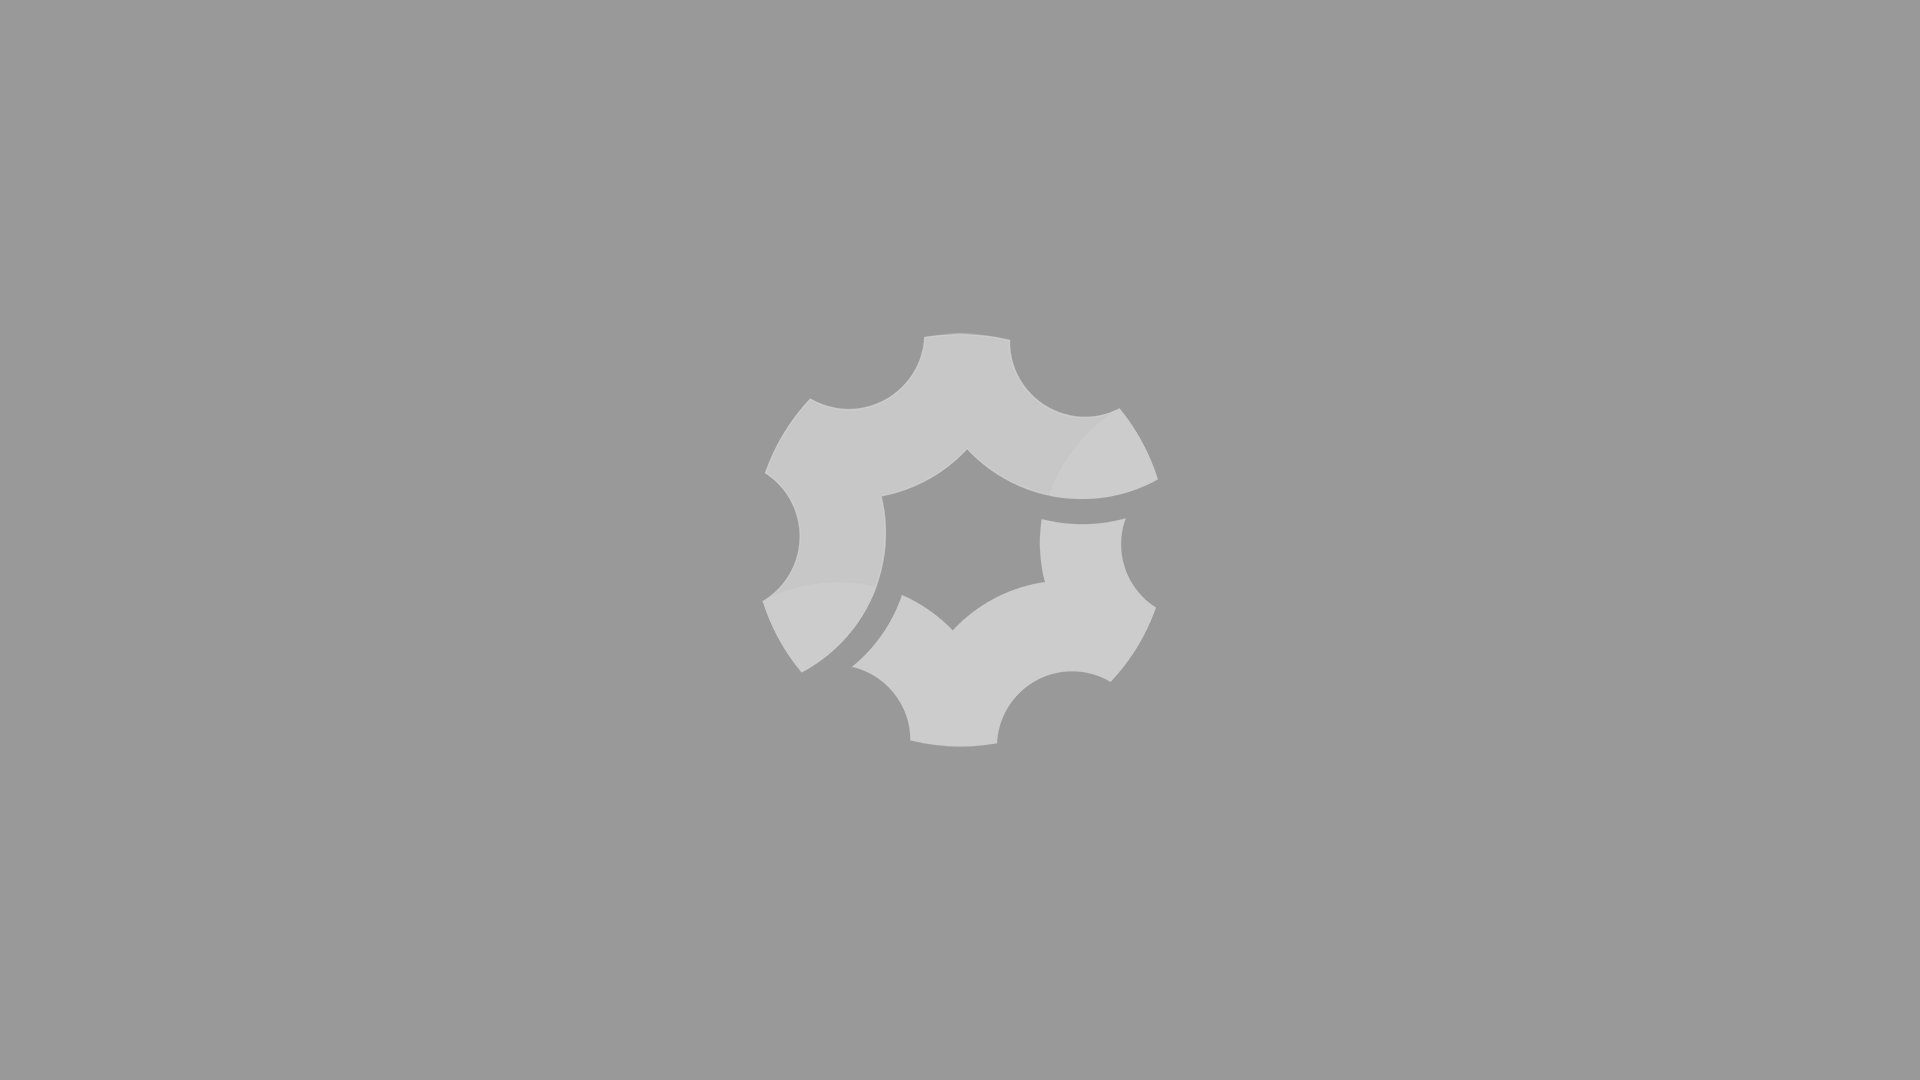 new_bitmap_image_4.bmp_thumb.png